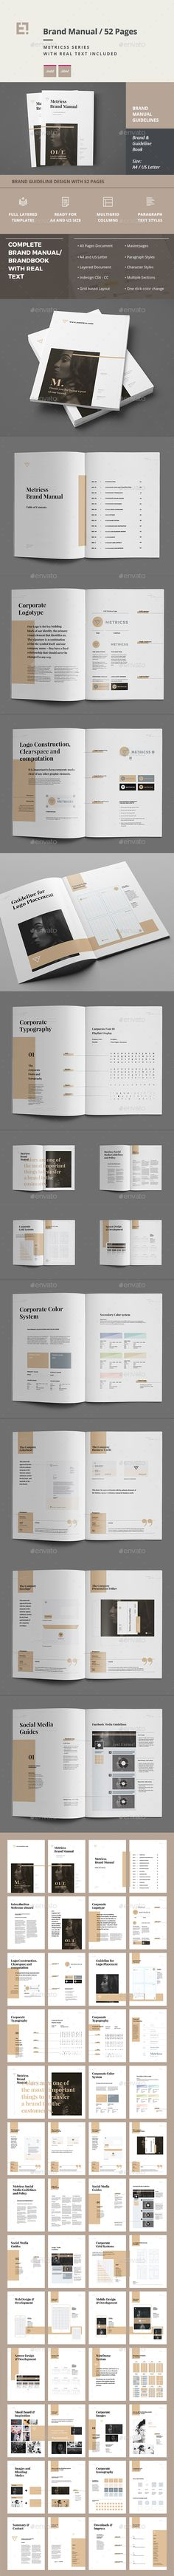 Brand Manual and Identity Template u2013 Corporate